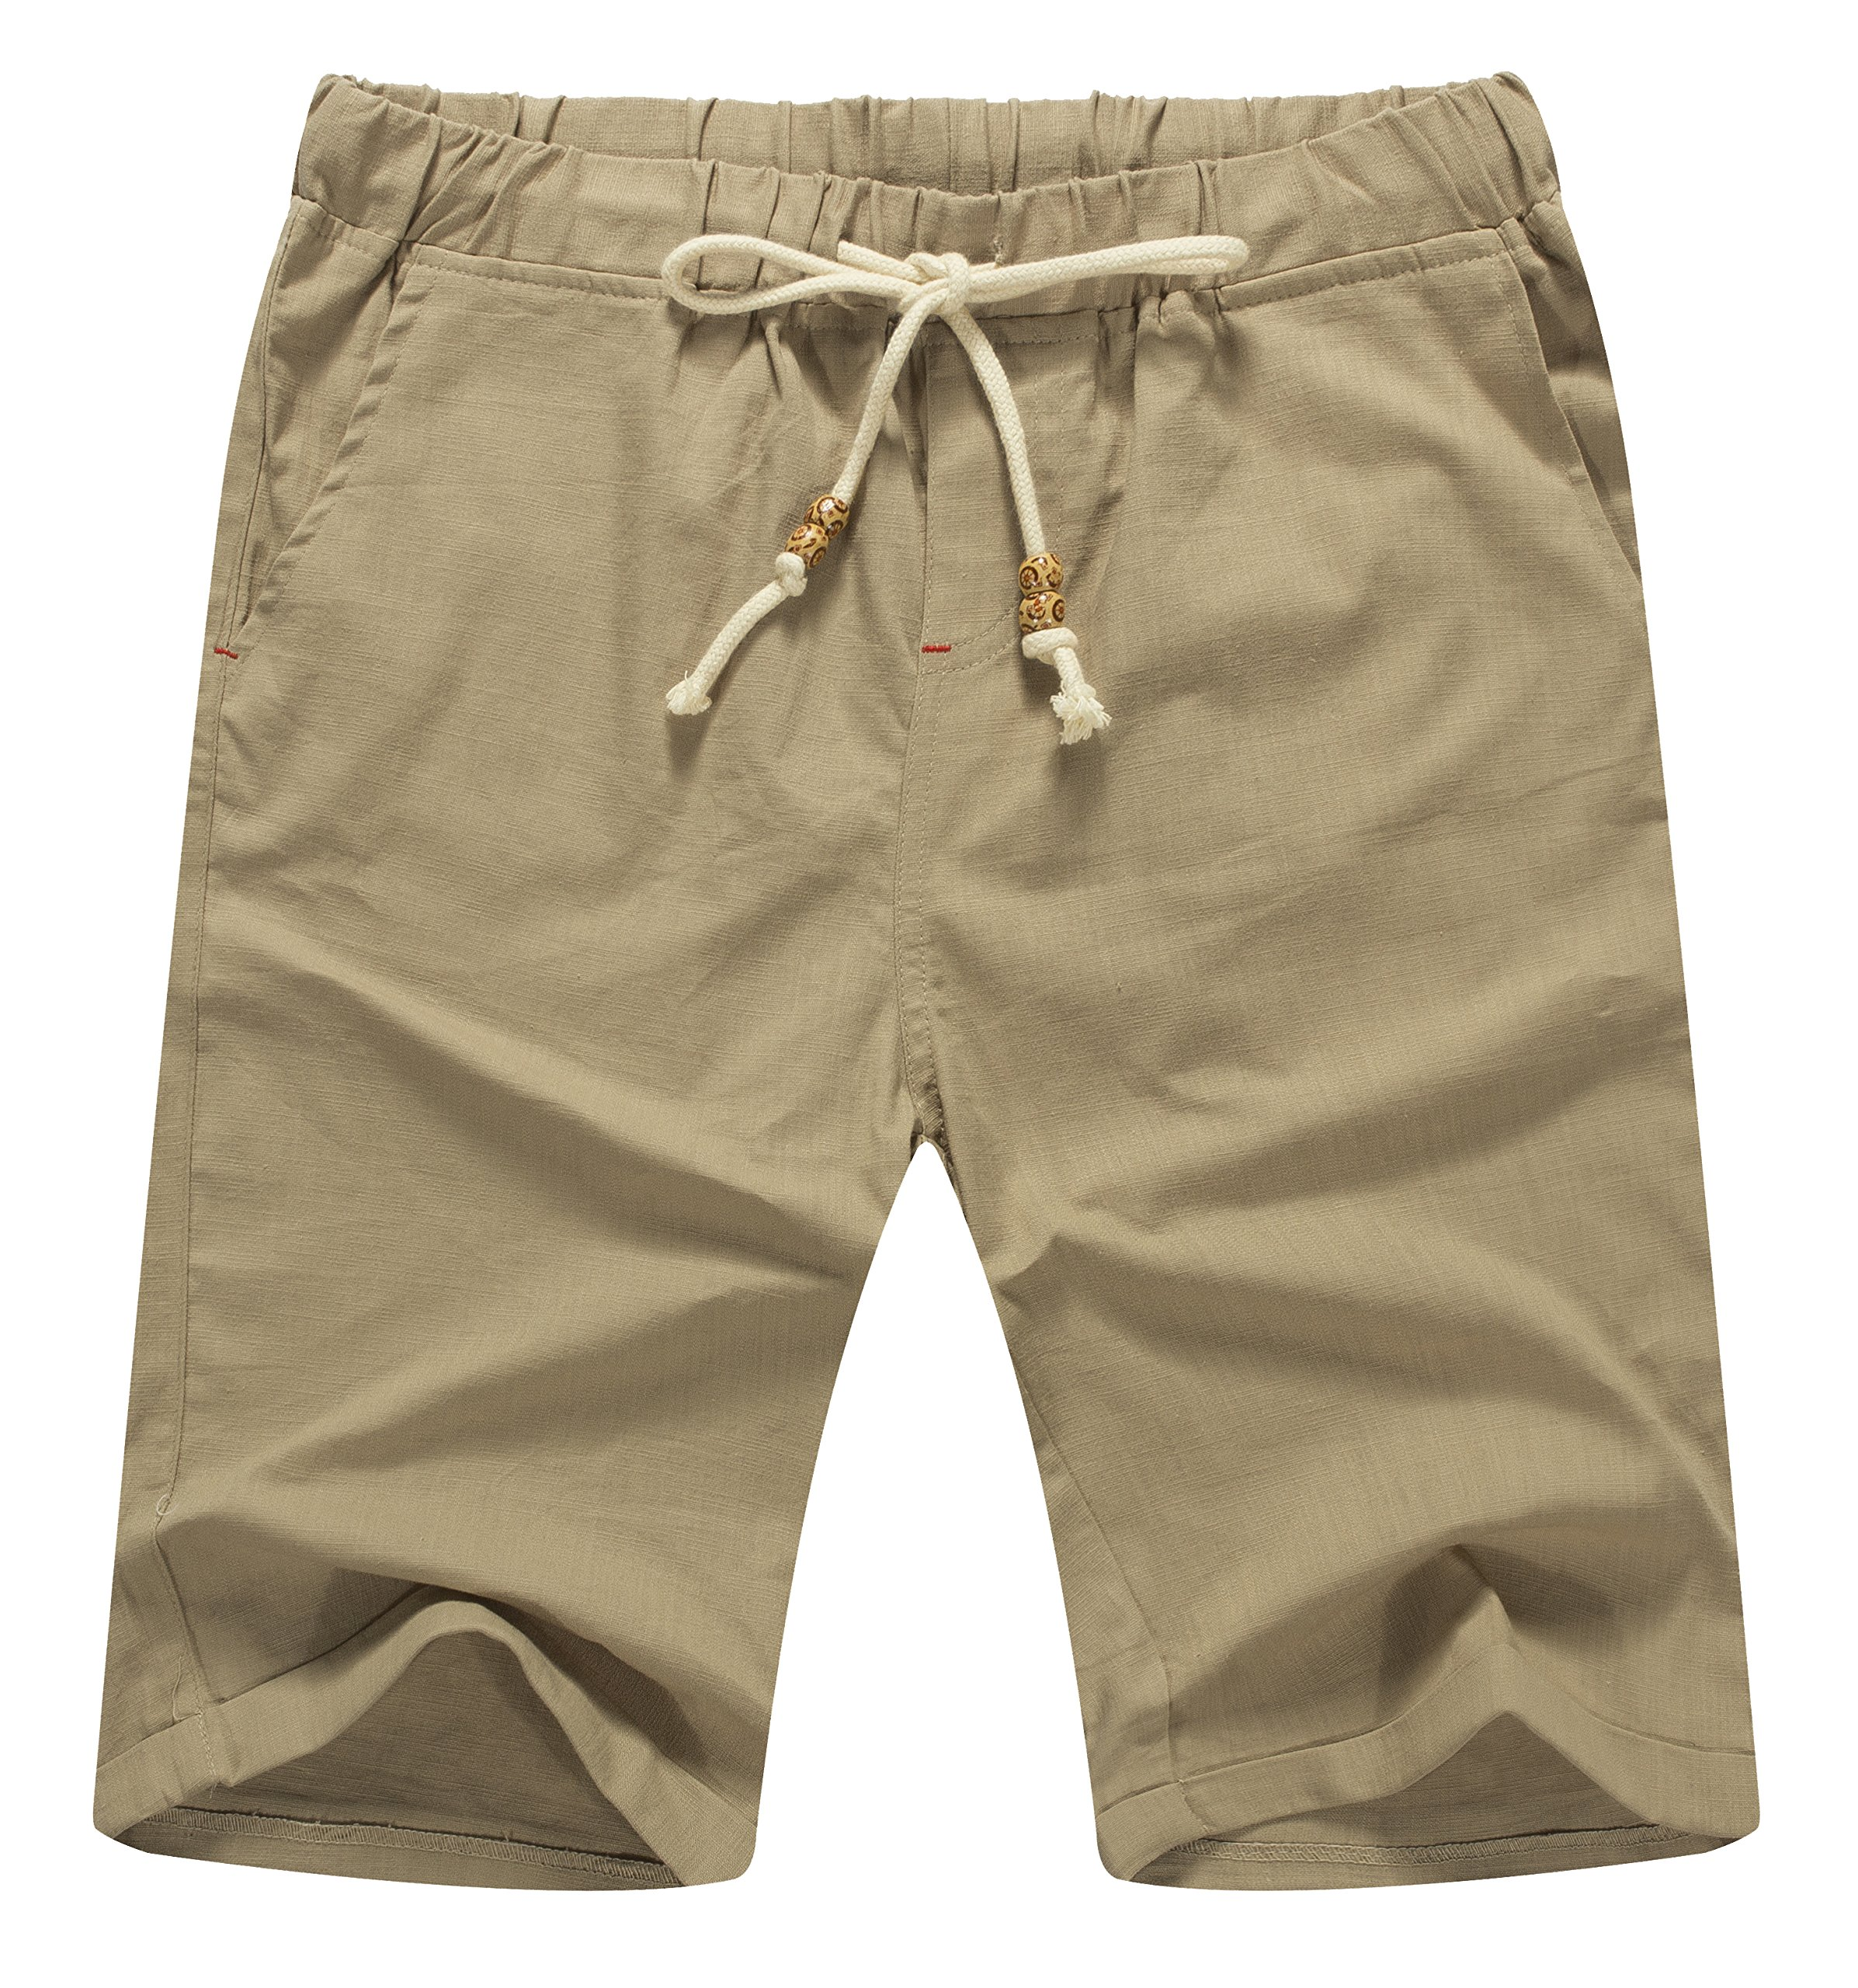 Mr.Zhang Men's Linen Casual Classic Fit Short Summer Beach Shorts Khaki-US M